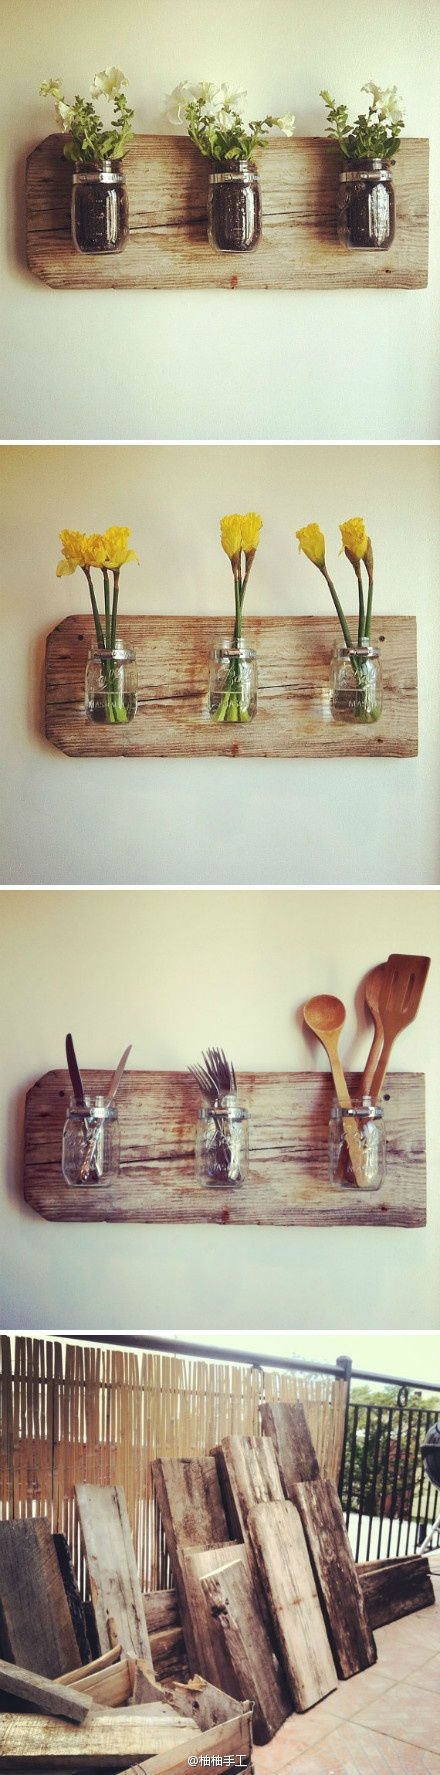 Fun idea for kitchen utensils or flowers